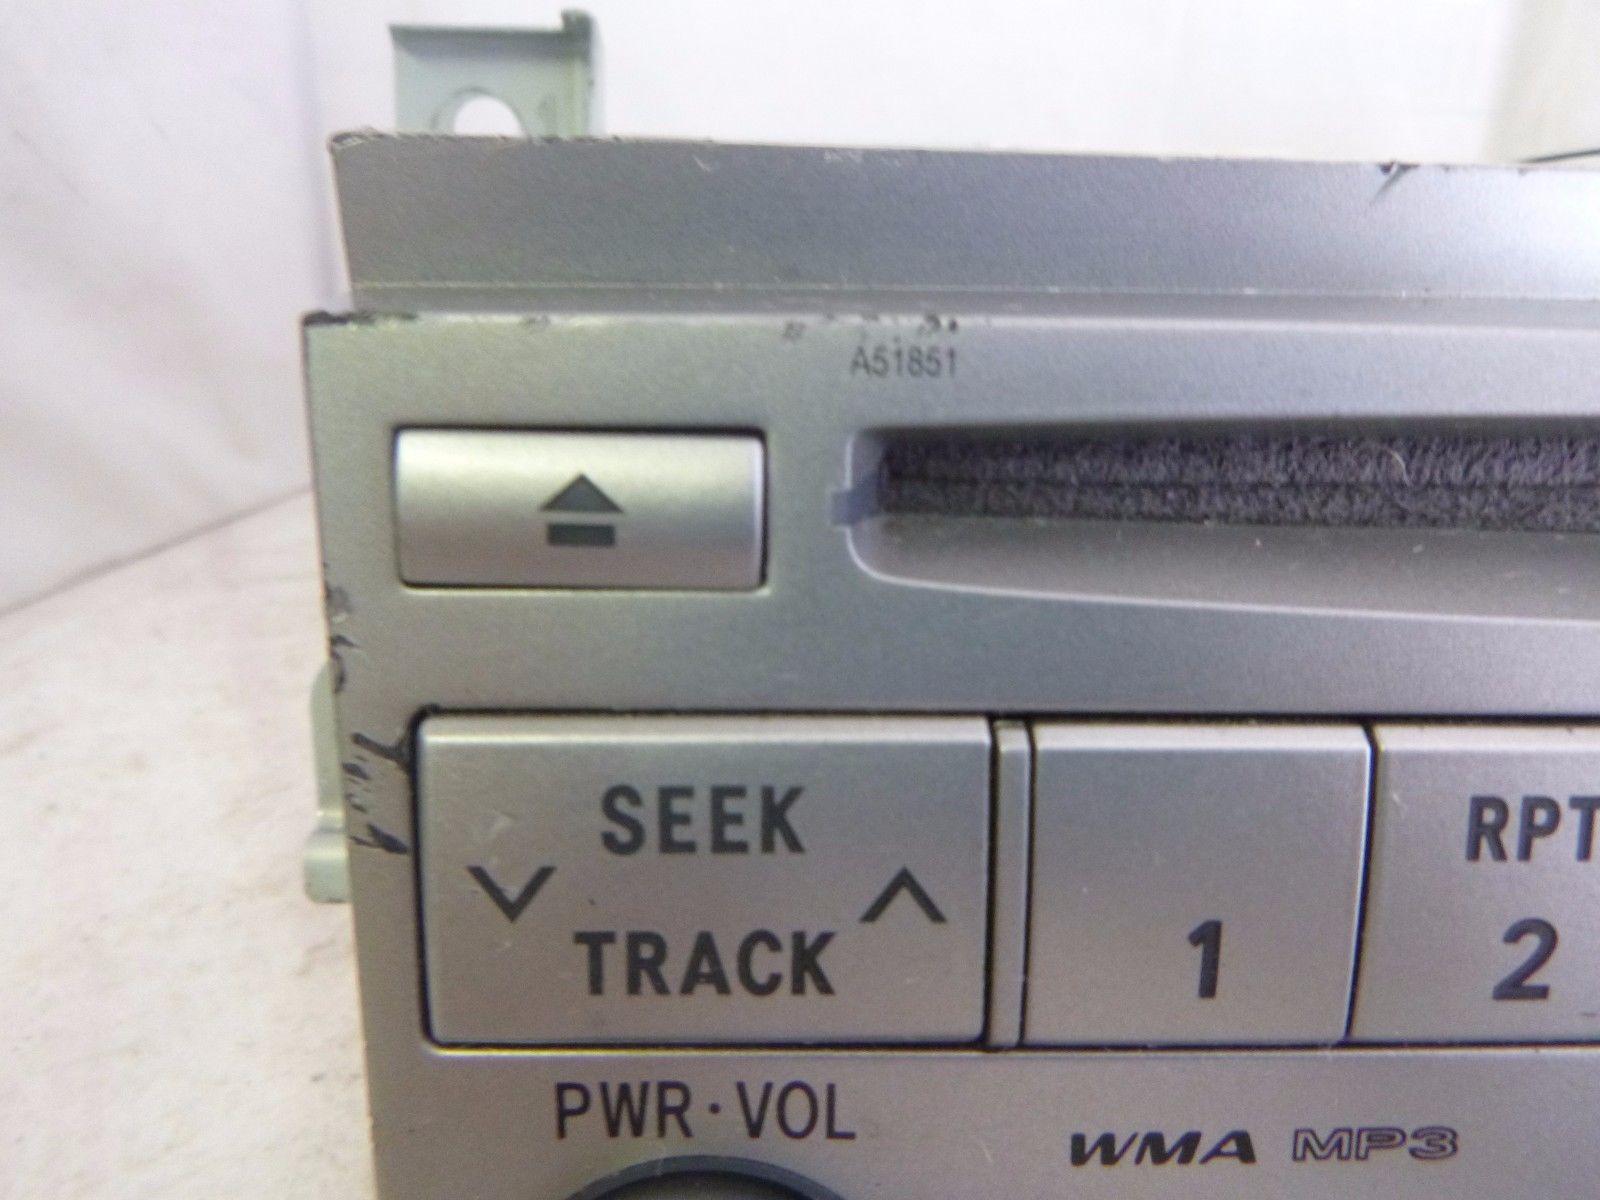 08 09 10 Toyota Avalon Radio 6 Disc Cd MP3 Player A51851 86120-07060 B8821